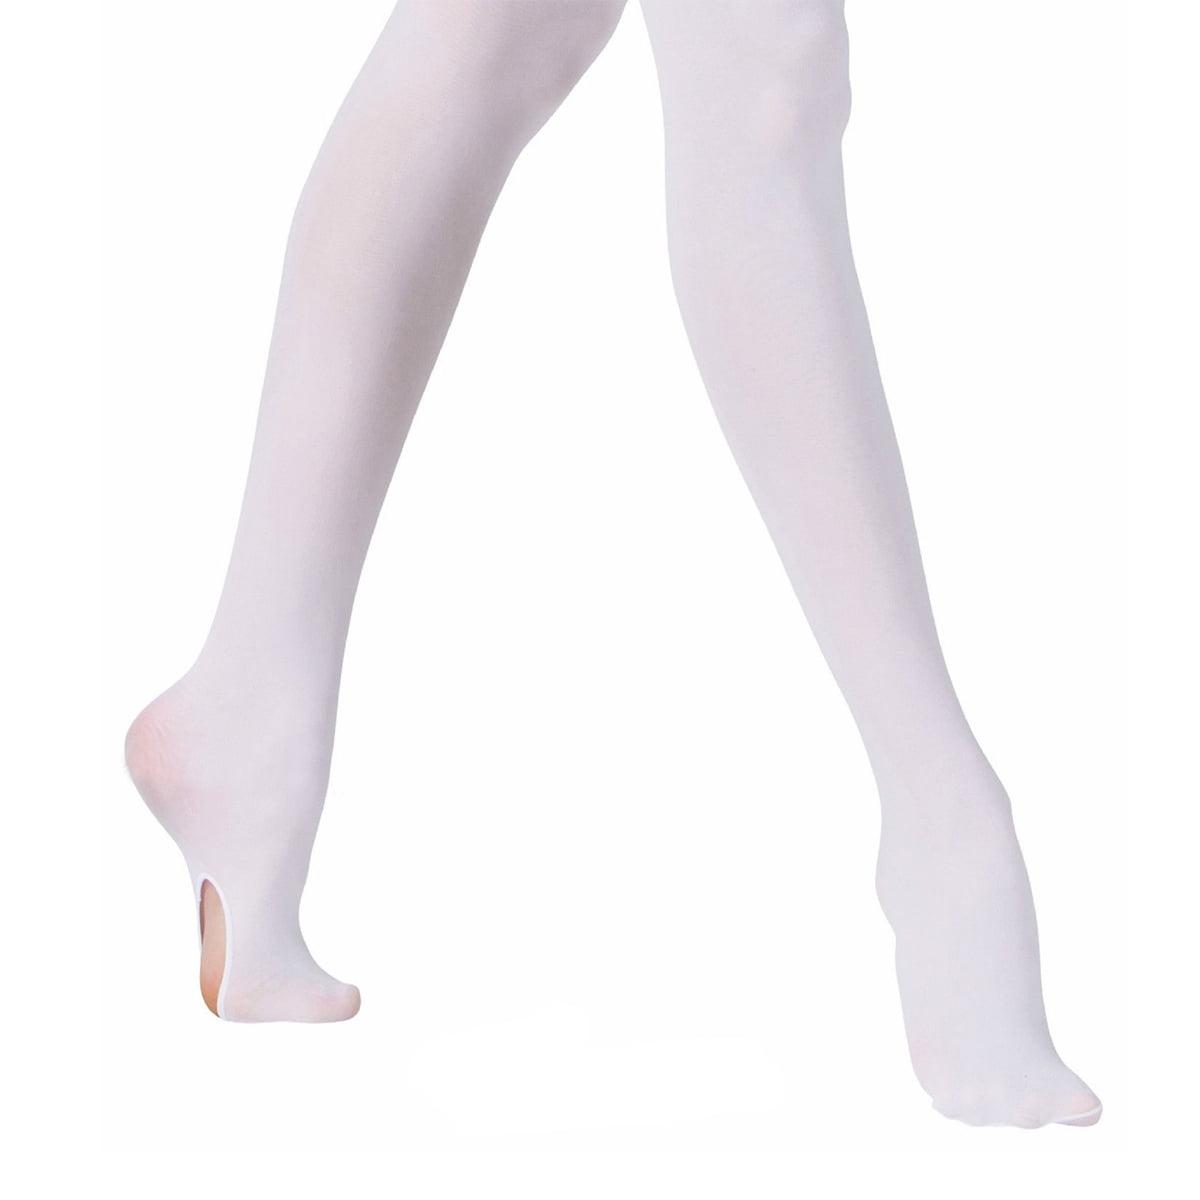 Slim Convertible Tights Pant Ballet Pantyhose Footed Socks Dance Stocking